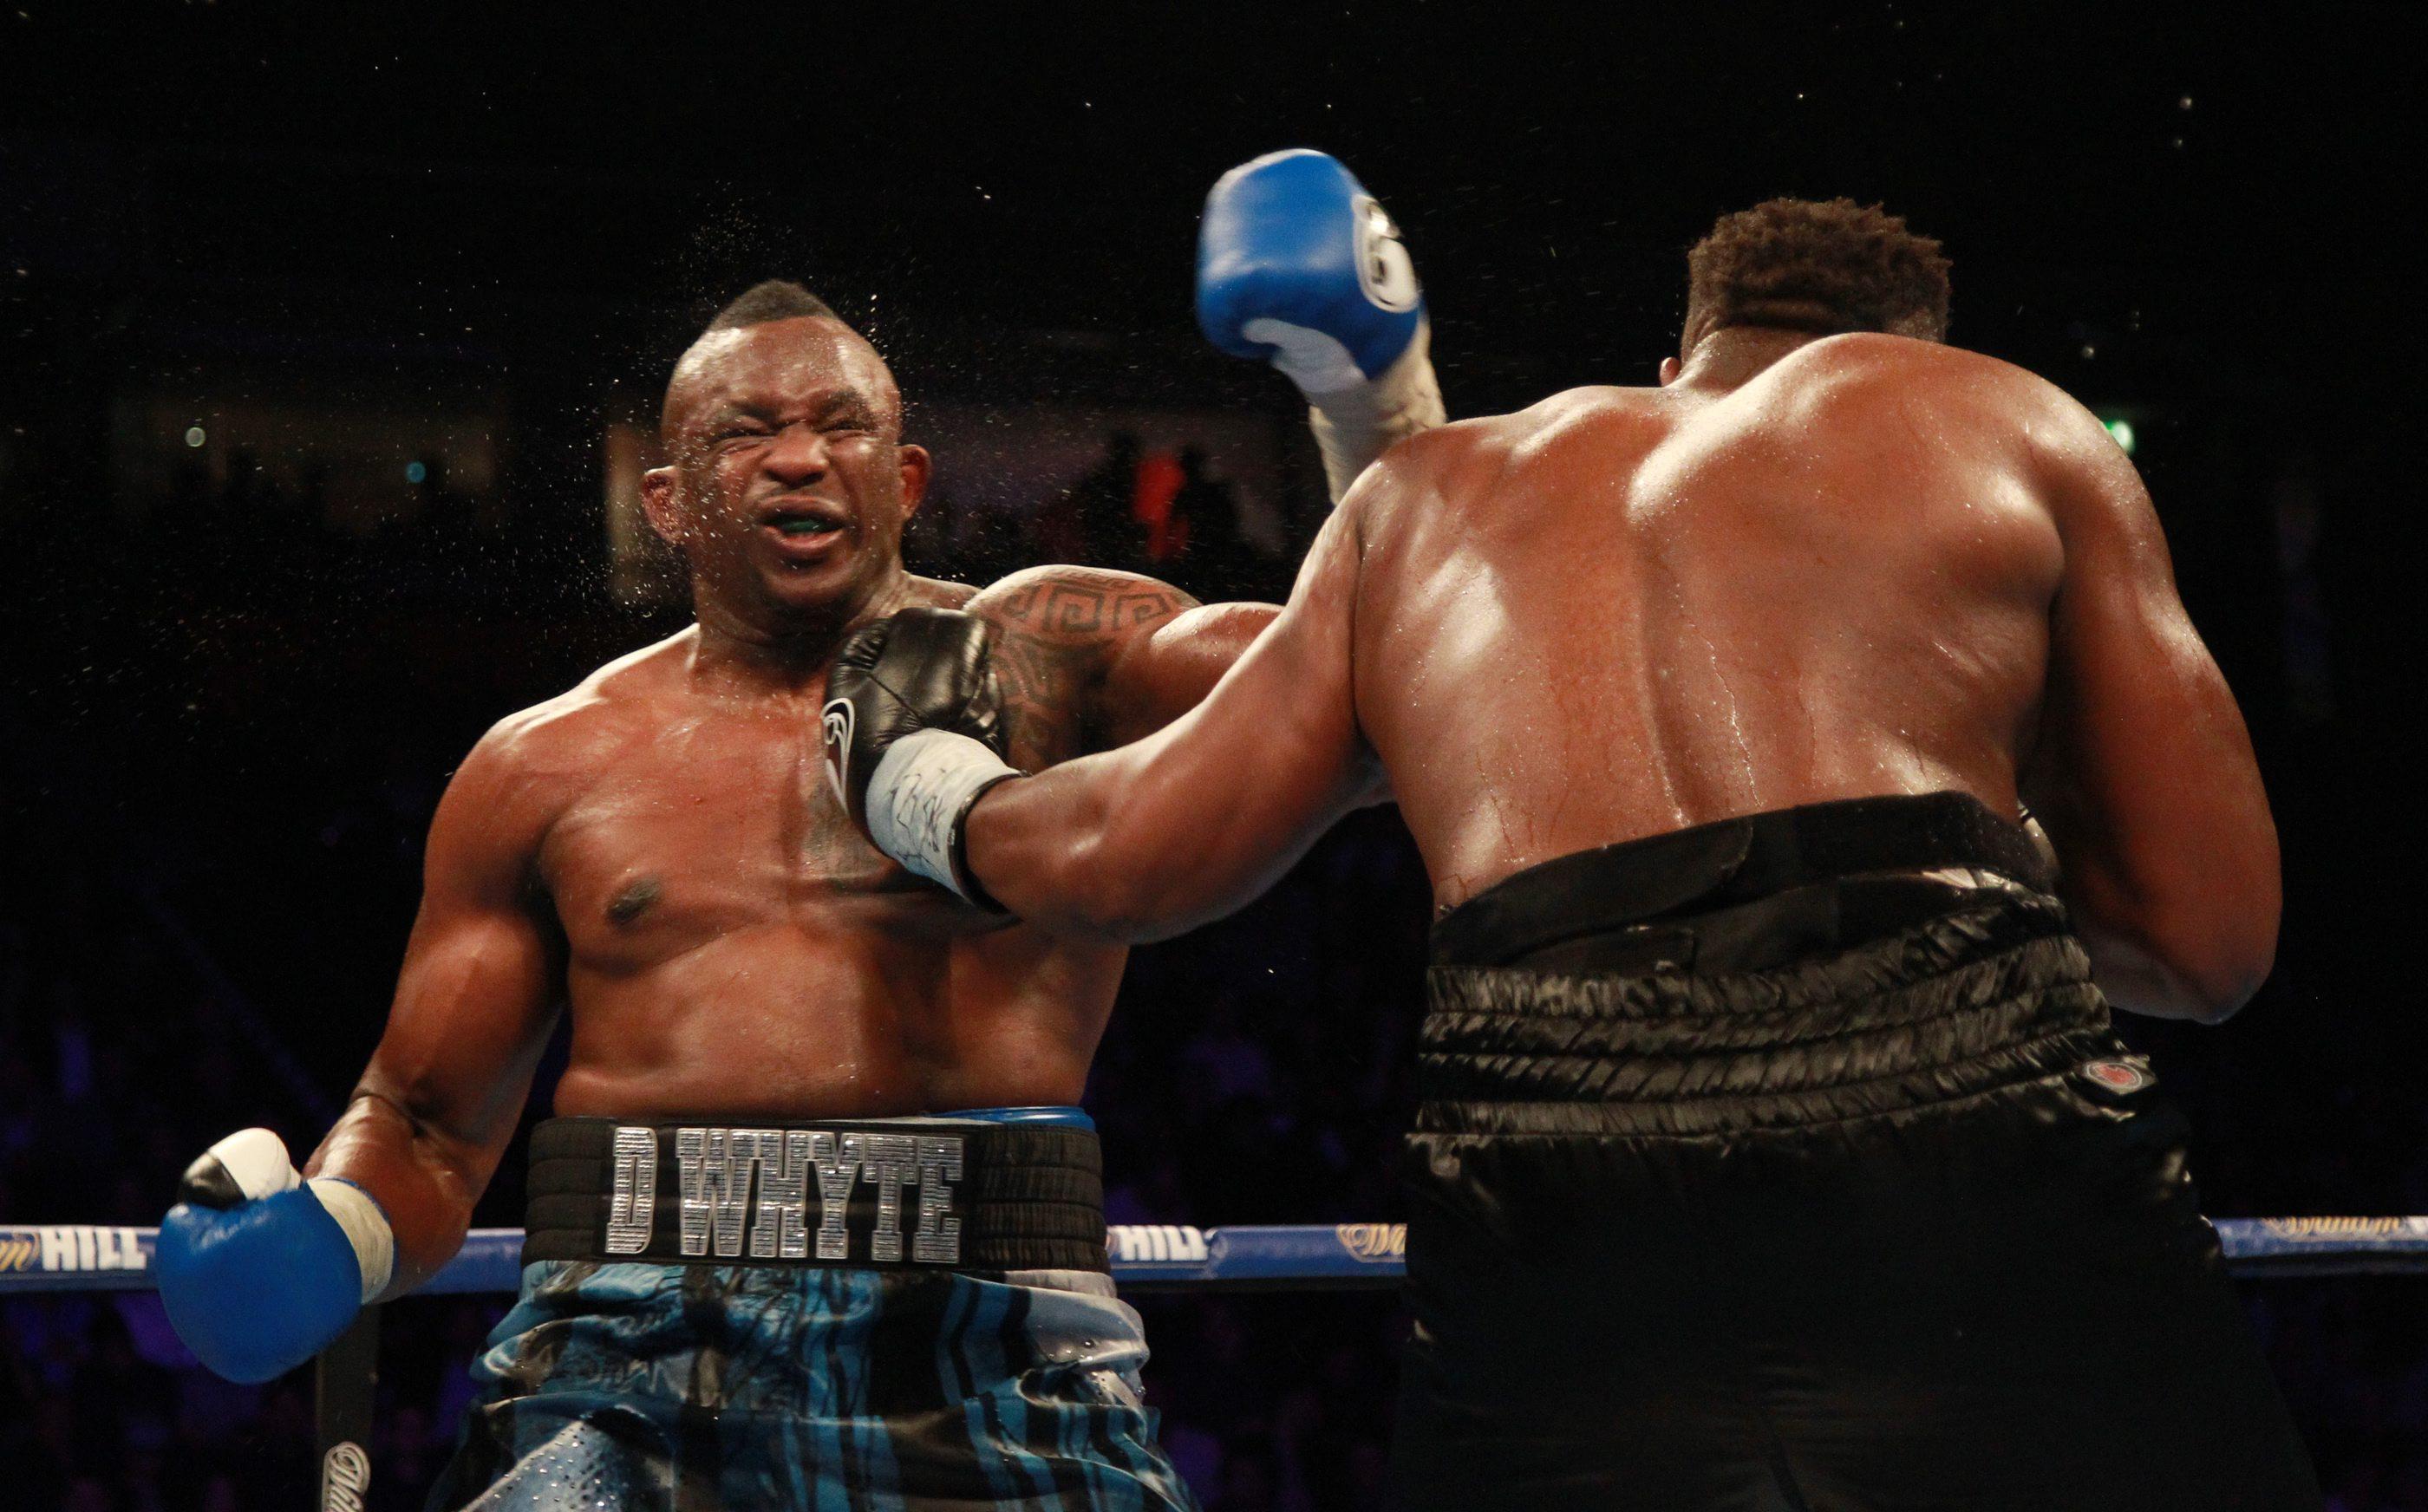 Dereck Chisora felt he won the war despite the judges decision for Whyte